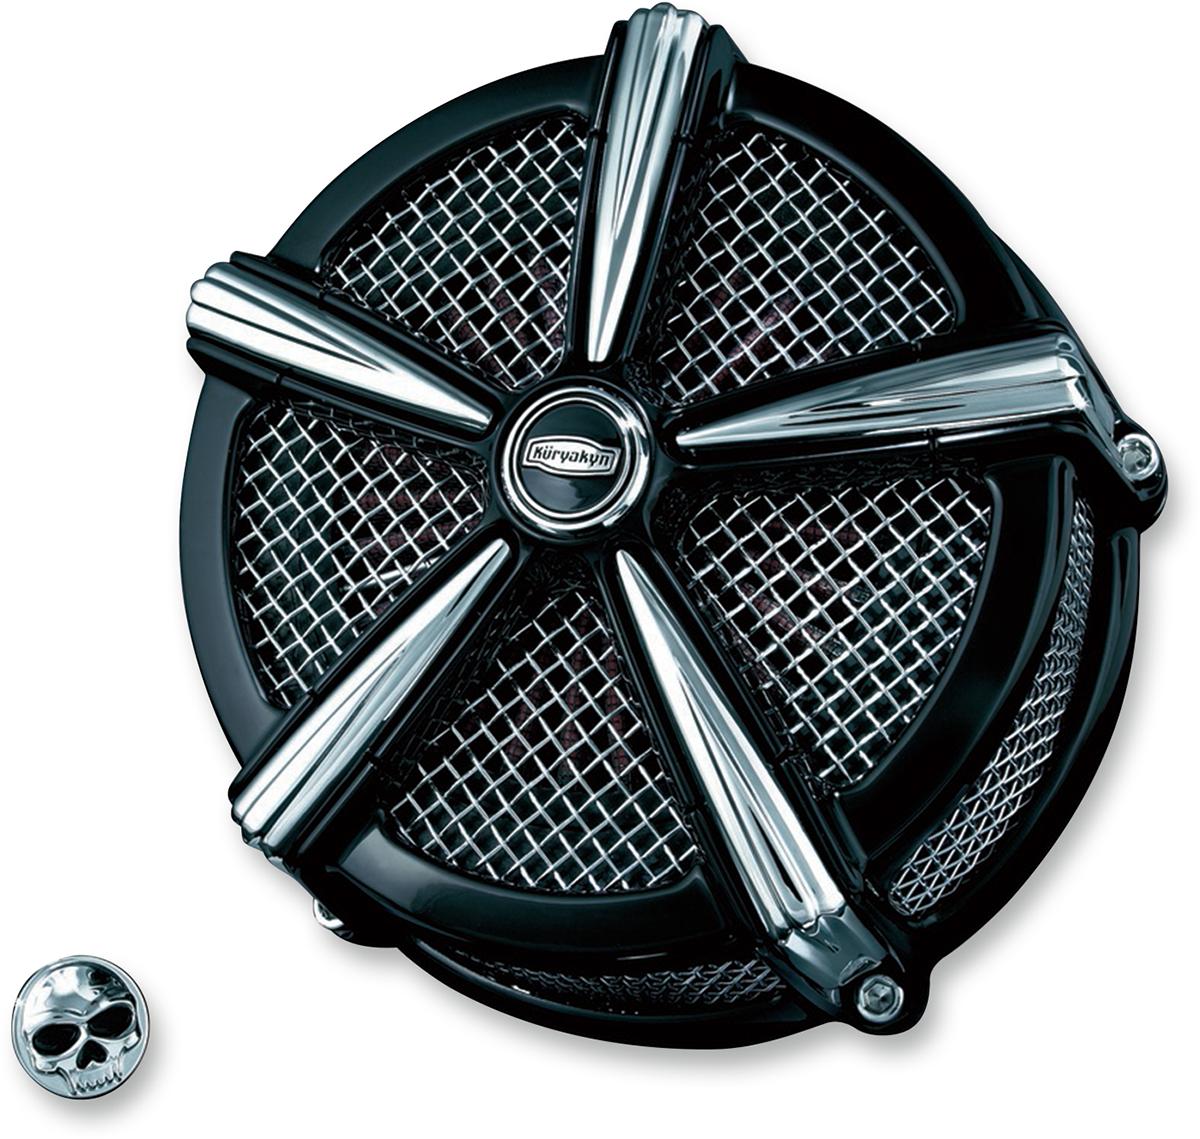 Kuryakyn 9549 Black Chrome Mach 2 Air Cleaner for 07-18 Harley Sportster XL